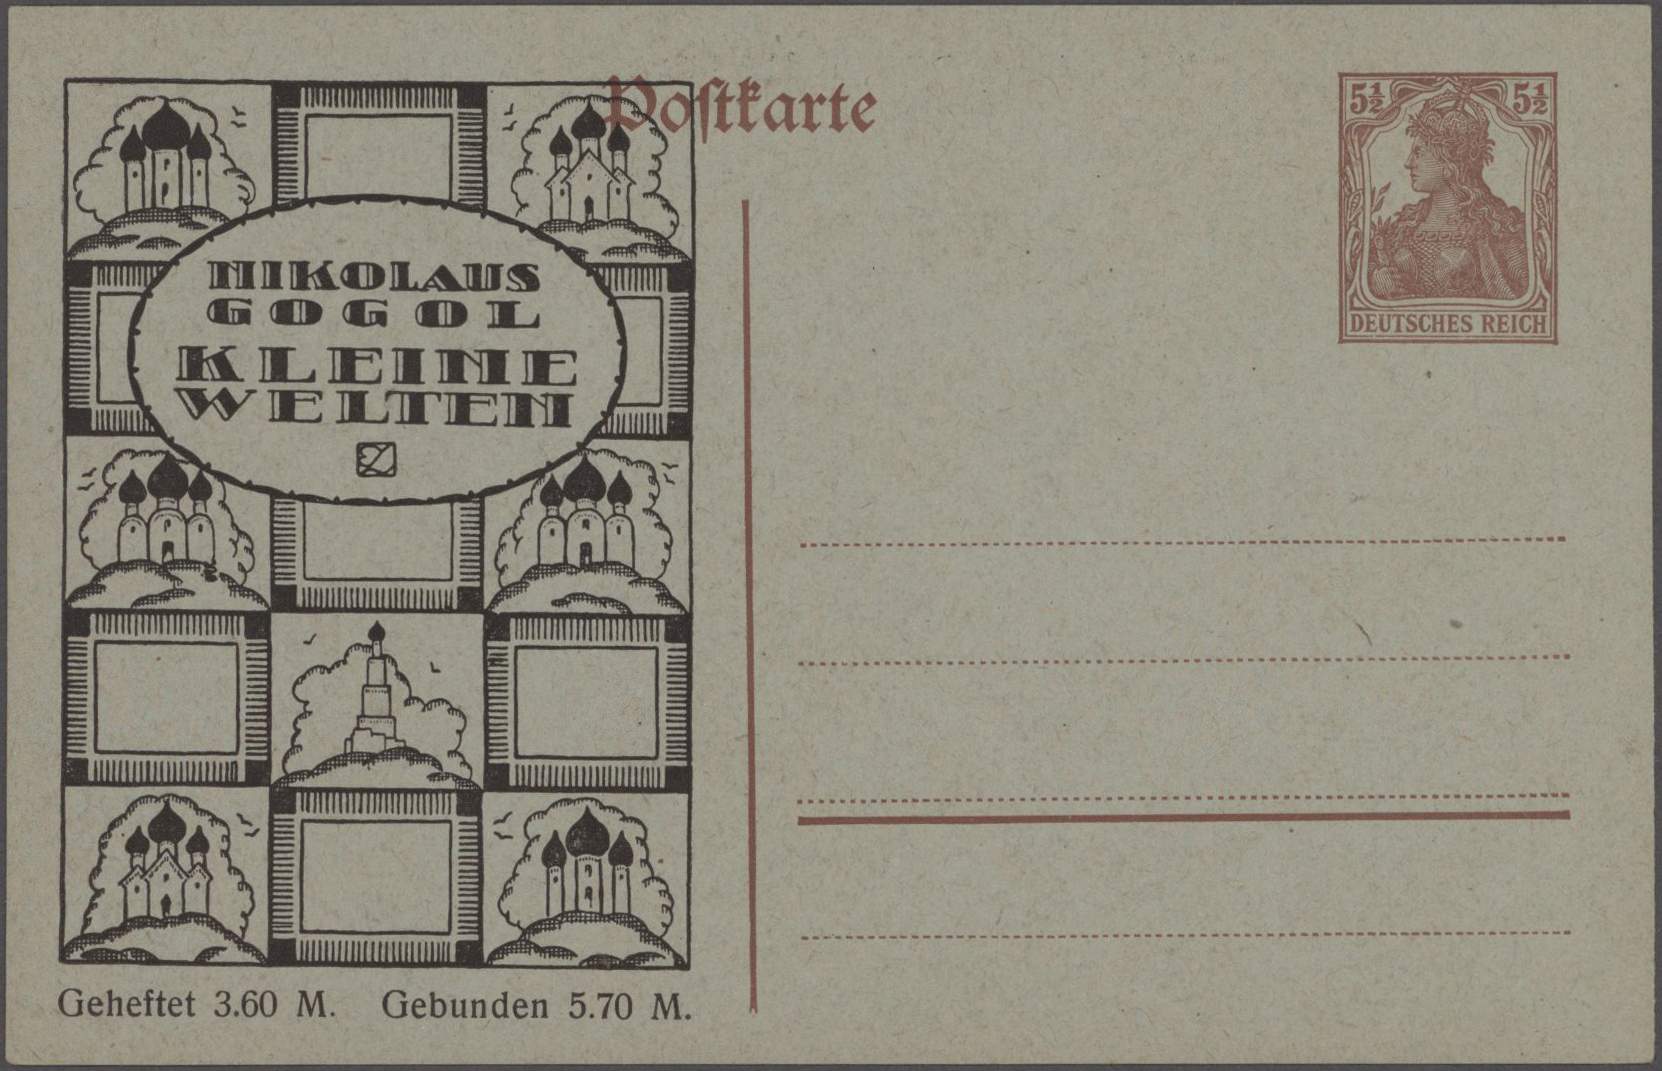 Lot 23534 - Deutsches Reich - Privatganzsachen  -  Auktionshaus Christoph Gärtner GmbH & Co. KG Sale #49 Collections Overseas, Thematics, Europe, Germany/Estates